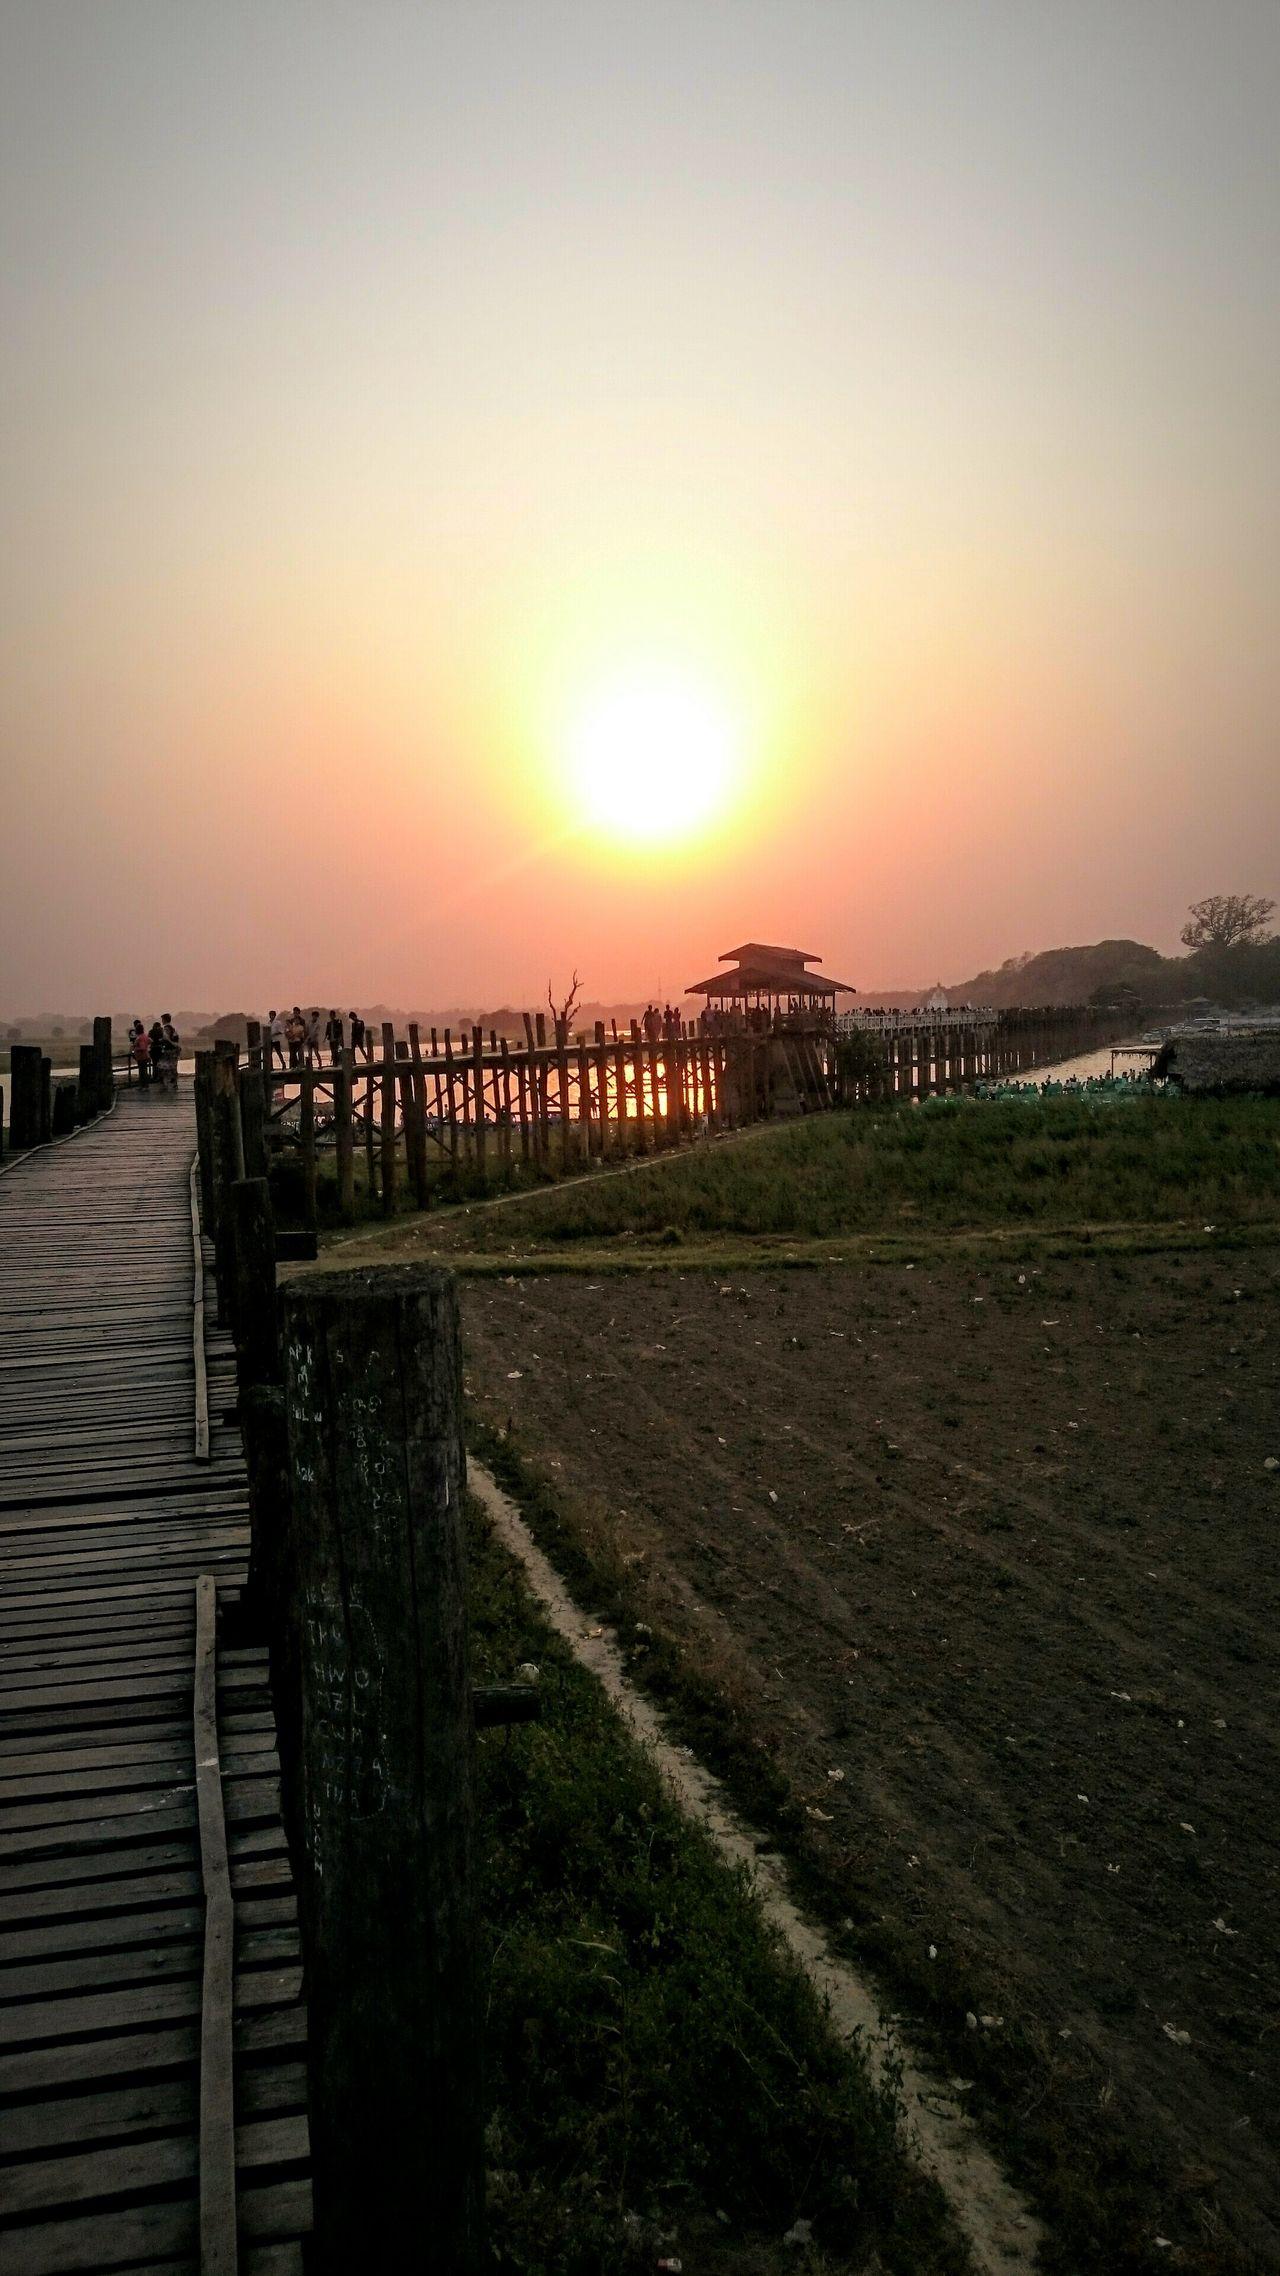 Amapura Mandalay Myanmar Burma Birma Dusk Sunset Purple Sky Sunset Silhouettes Sun Goes Down Teak Bridge The Longest Teak Bridge In The World Red Skies The Great Outdoors With Adobe Golden Moments